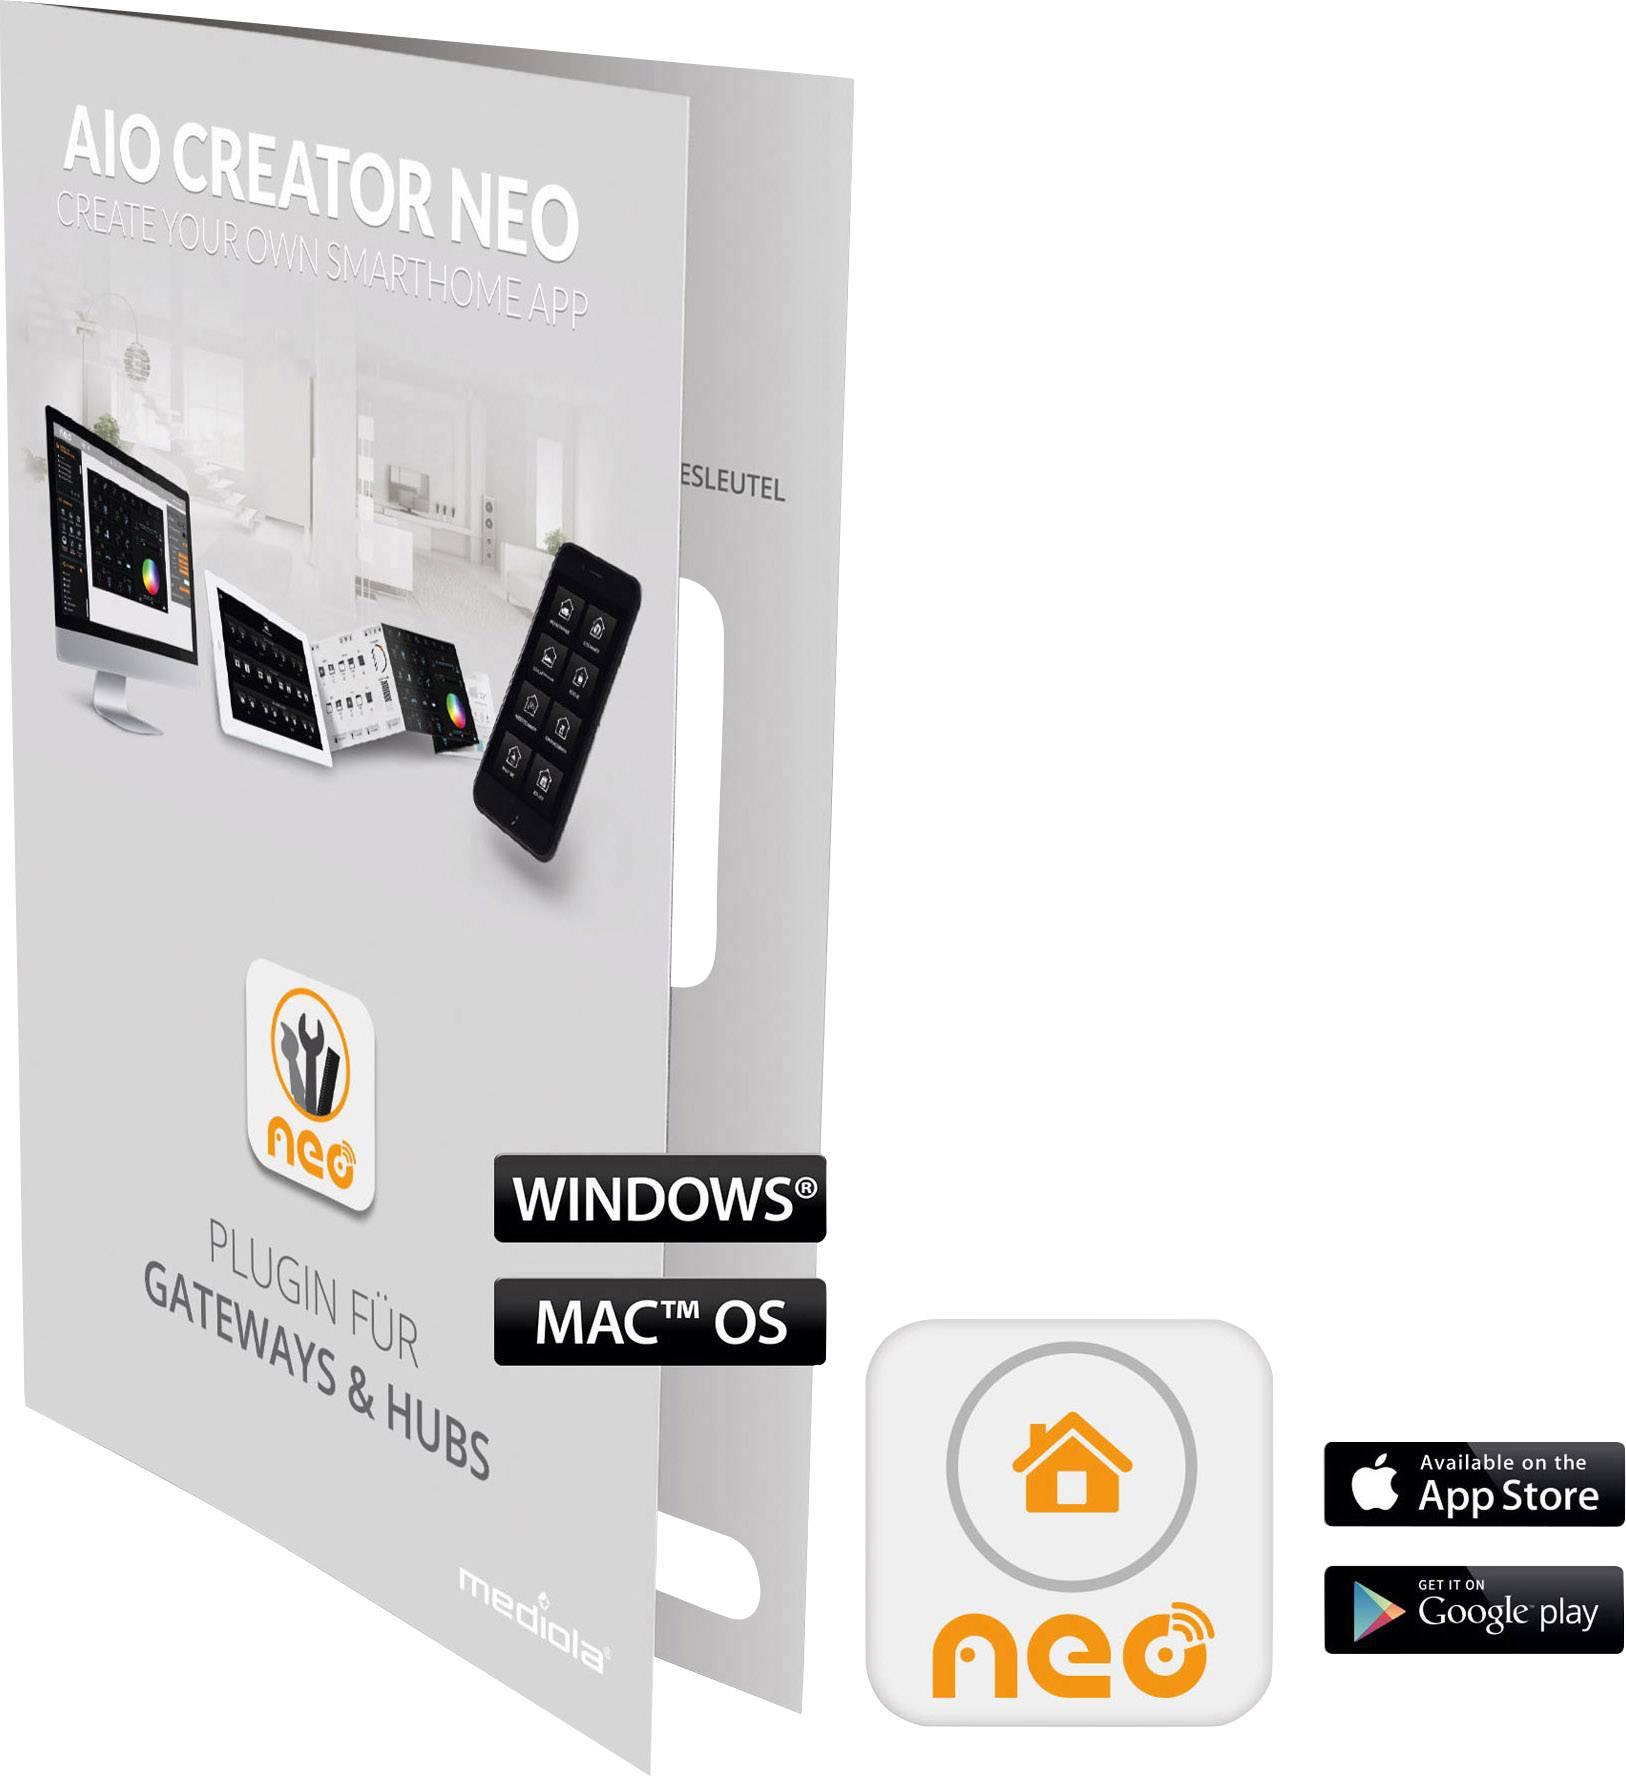 Doplňujúci software Mediola SUM-4121-b AIO CREATOR NEO Rademacher Homepilot